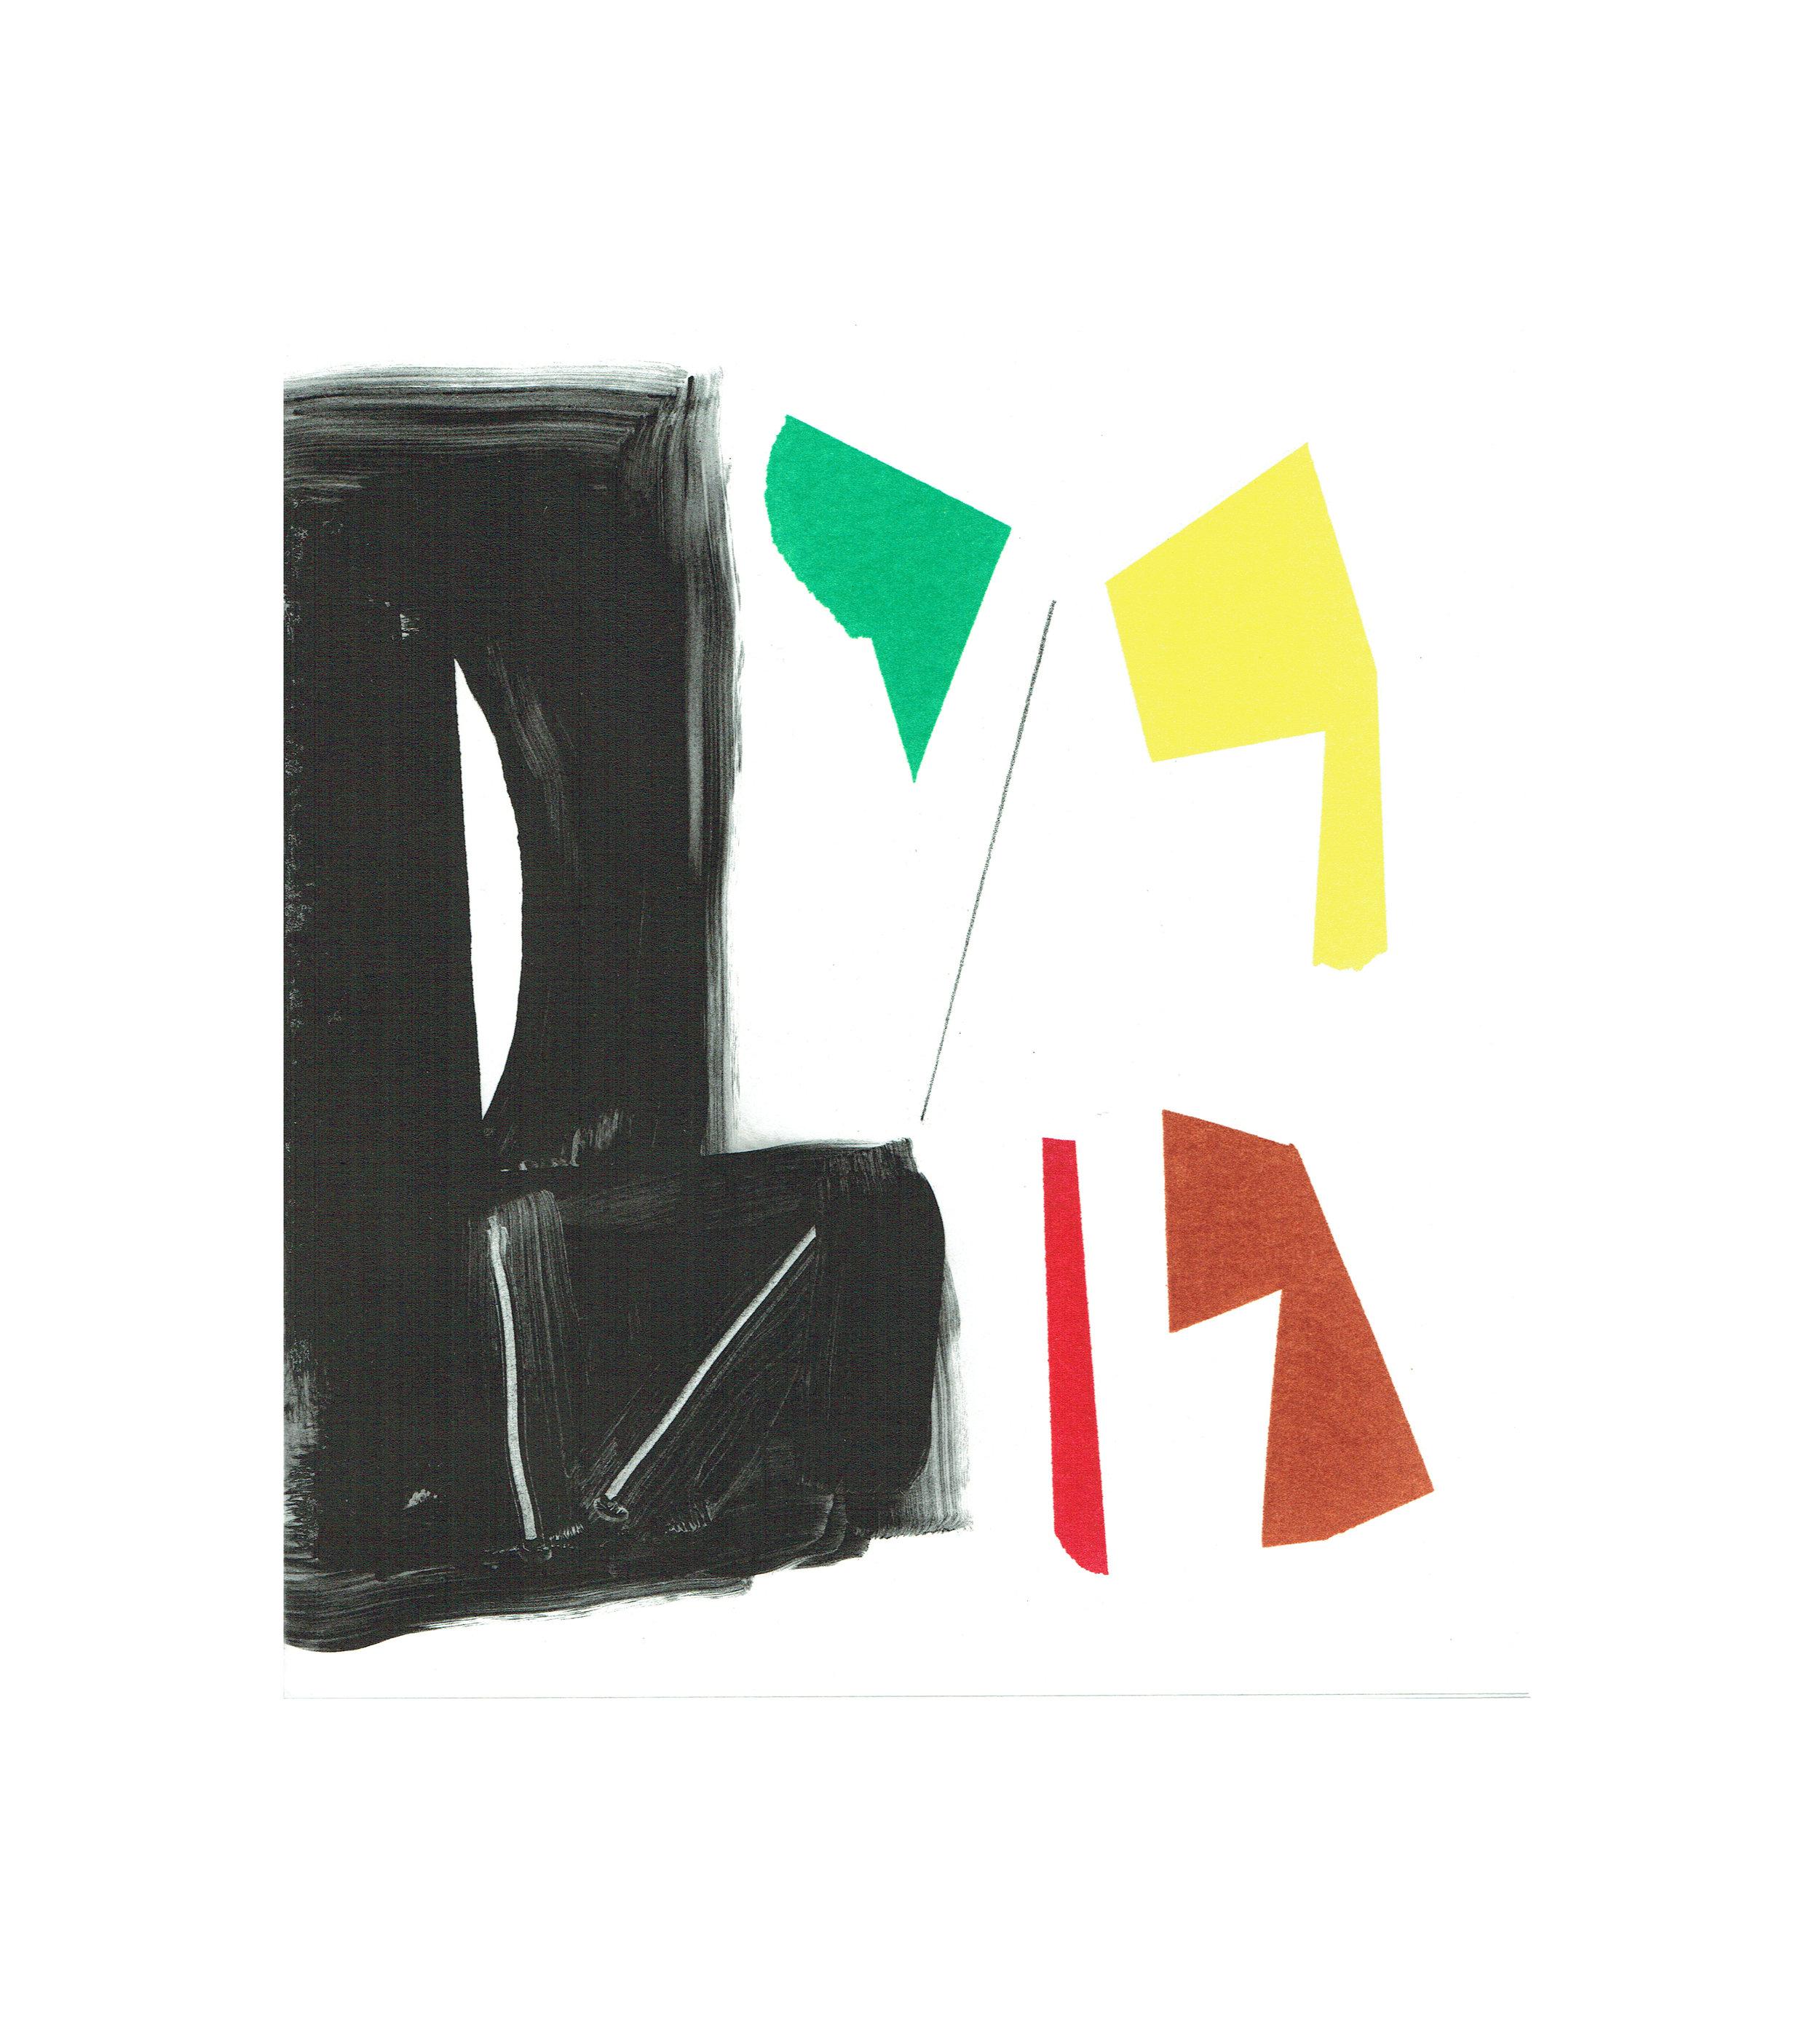 John McLean, Merry Go Round 6    Date: 2016  Size (cm - unframed):  38.2 x 34.4  Technique:  2 plate a la poupee etching  Materials:  Somerset Valvet 300gsm  Edition size:  20  Publisher: The Print Studio  Copyright: The Artist   POA